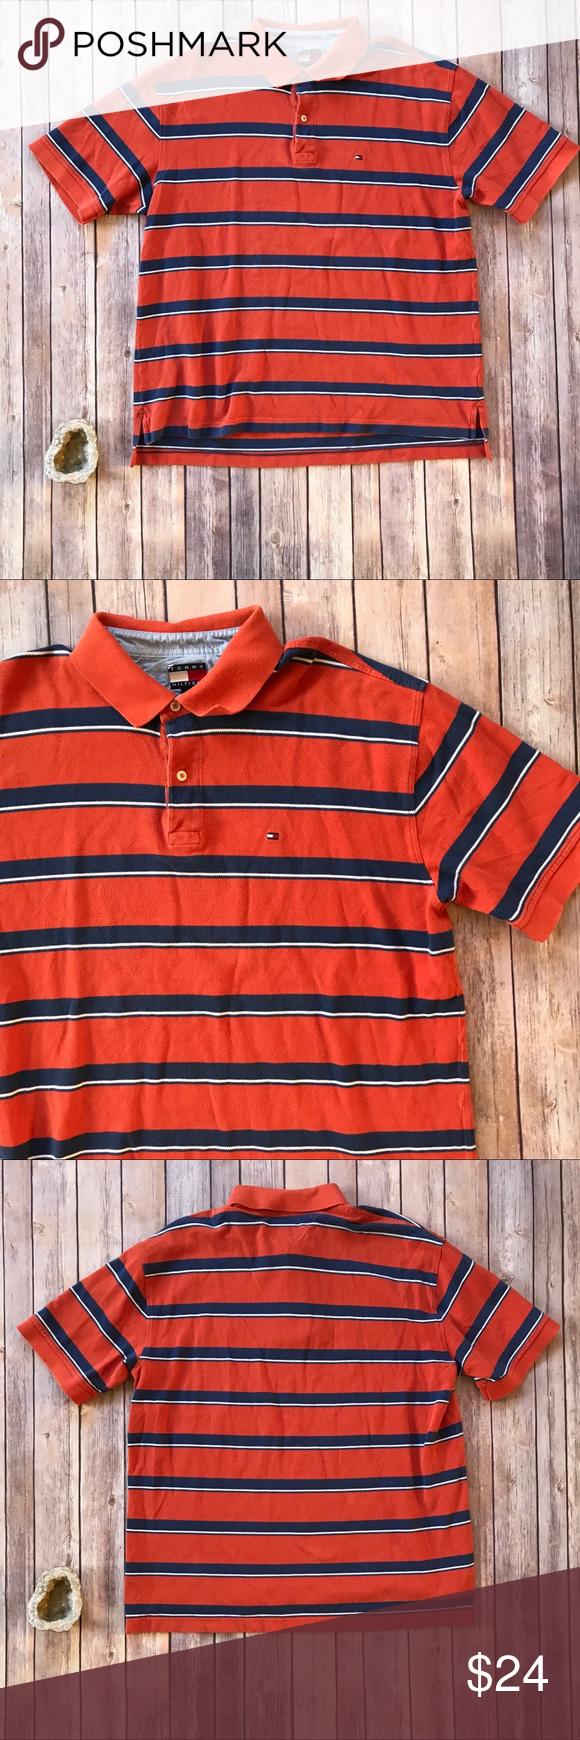 22a7c29e Tommy Hilfiger Vintage striped polo shirt men's XL This is a vintage Tommy  Hilfiger striped polo shirt in orange and navy blue stripes.